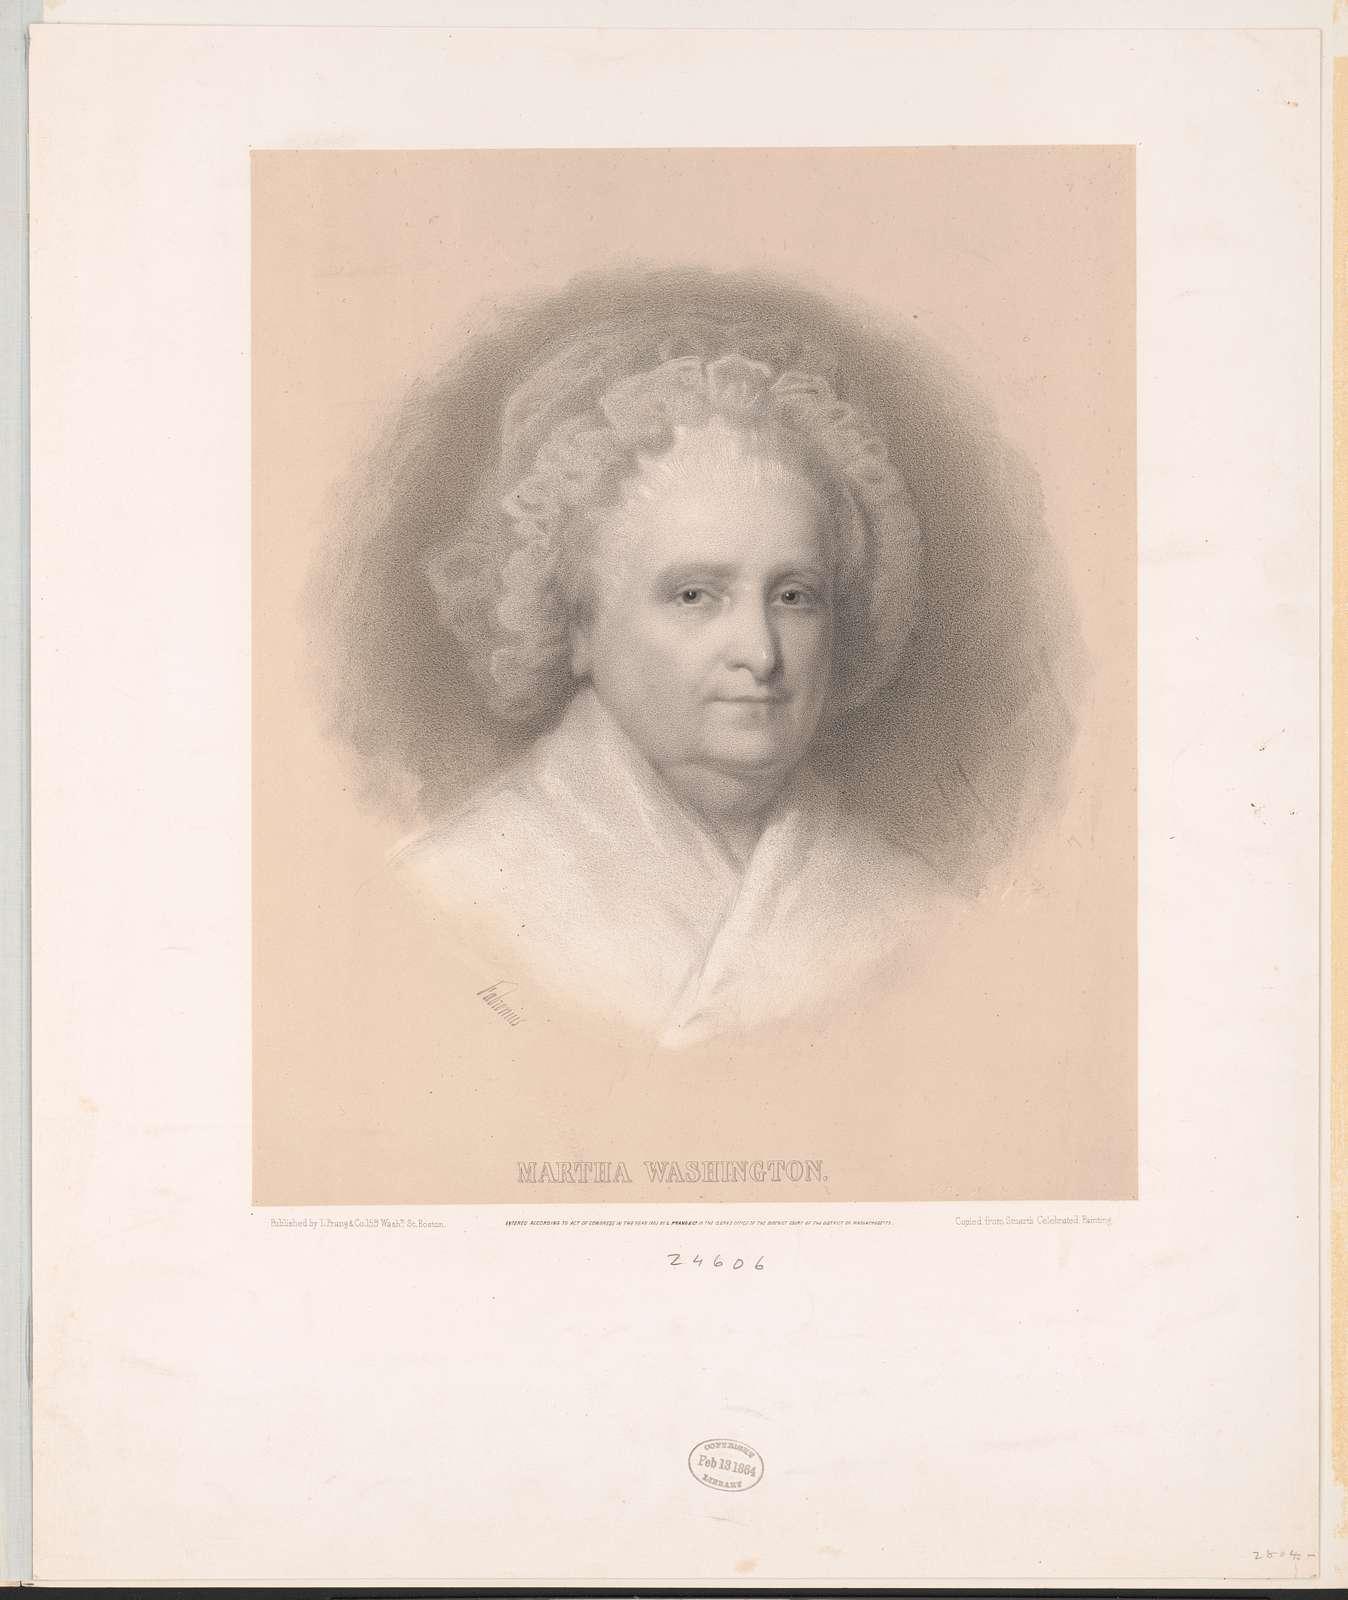 Martha Washington / published by L. Prang.